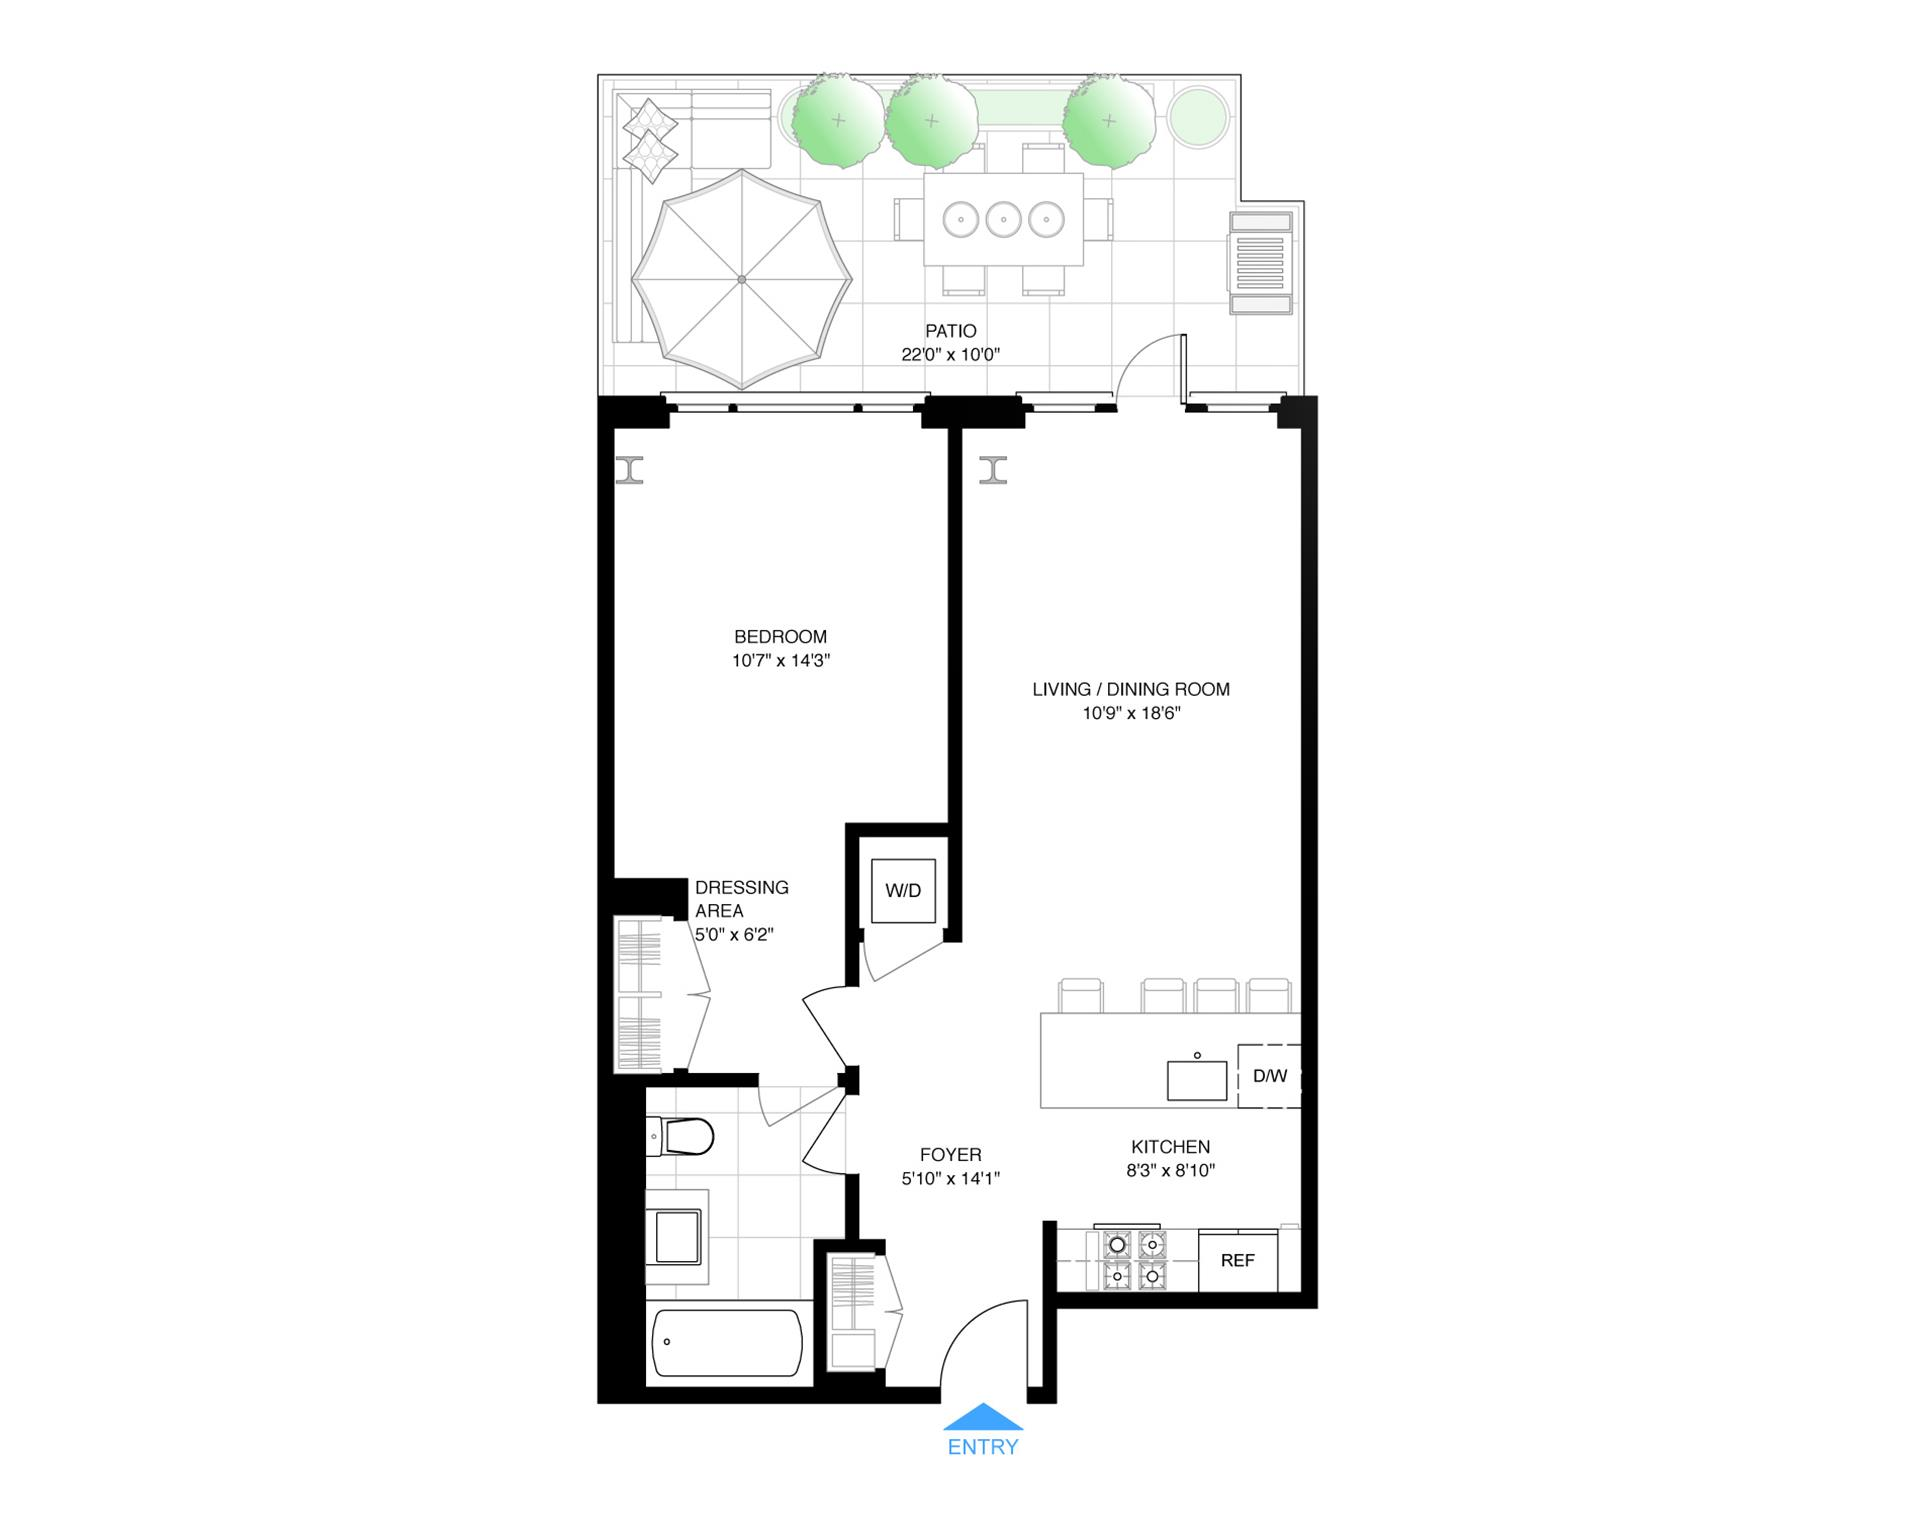 Floor plan of 161 North 4th St, 1H - Williamsburg, New York